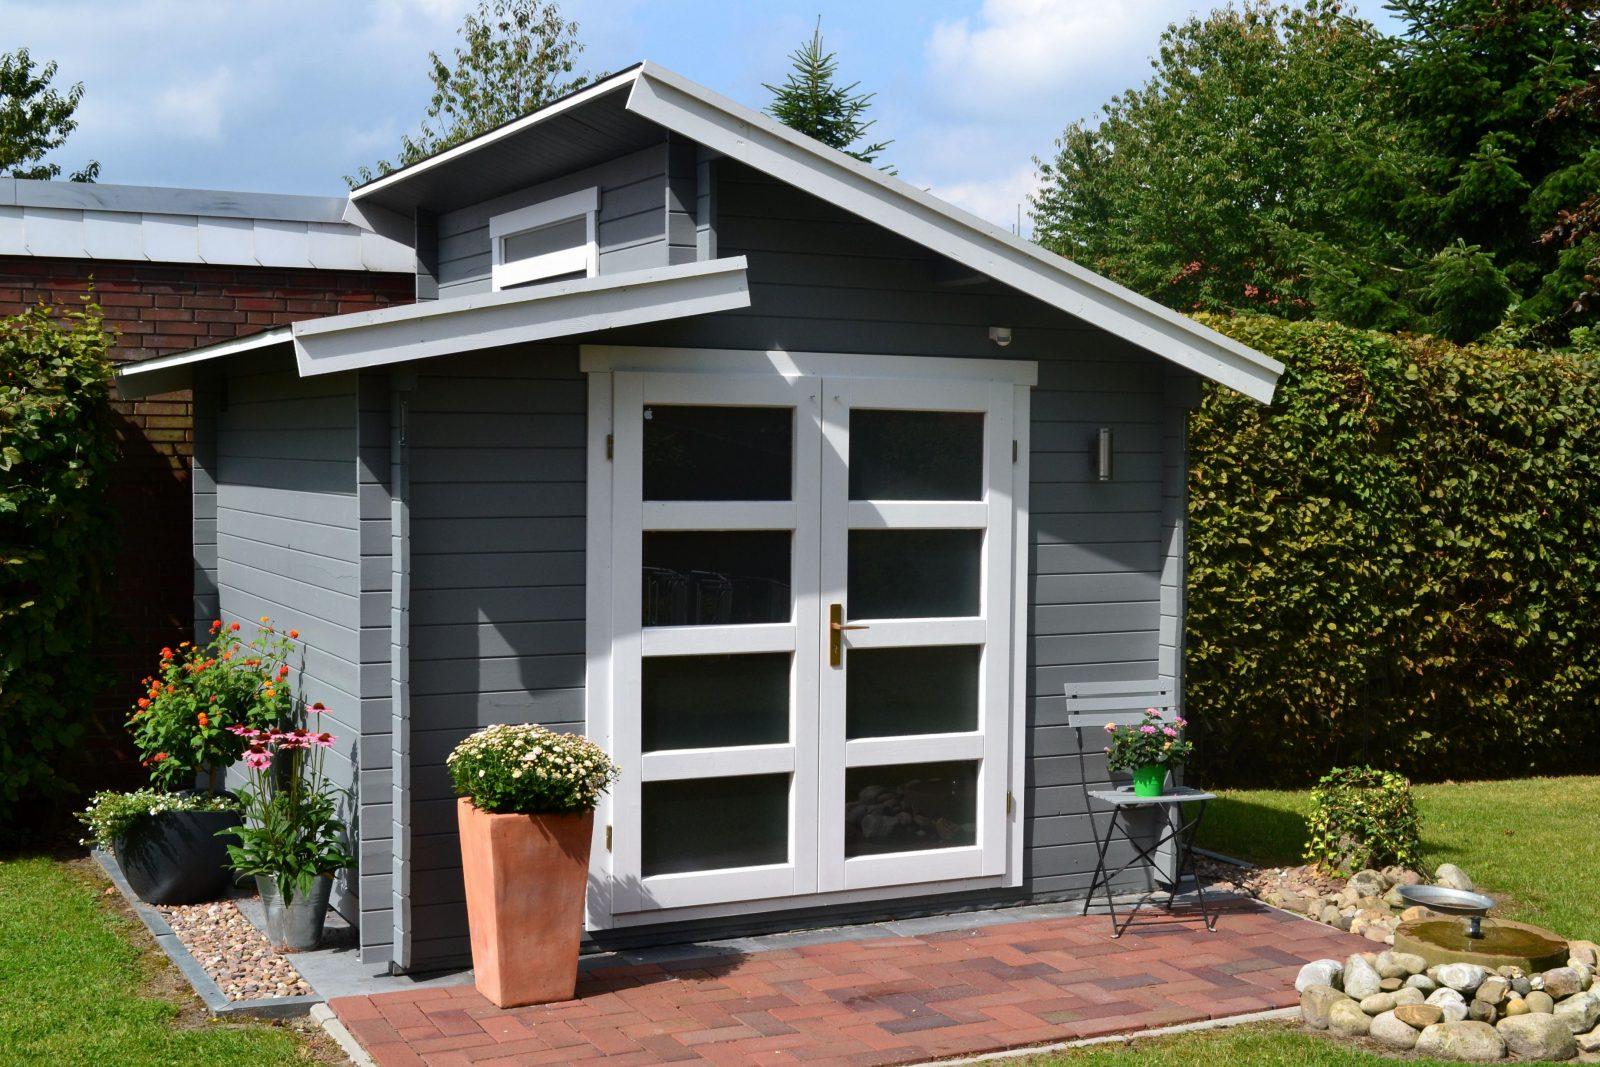 Gartenhaus Modern Selber Bauen | Haus Bauen